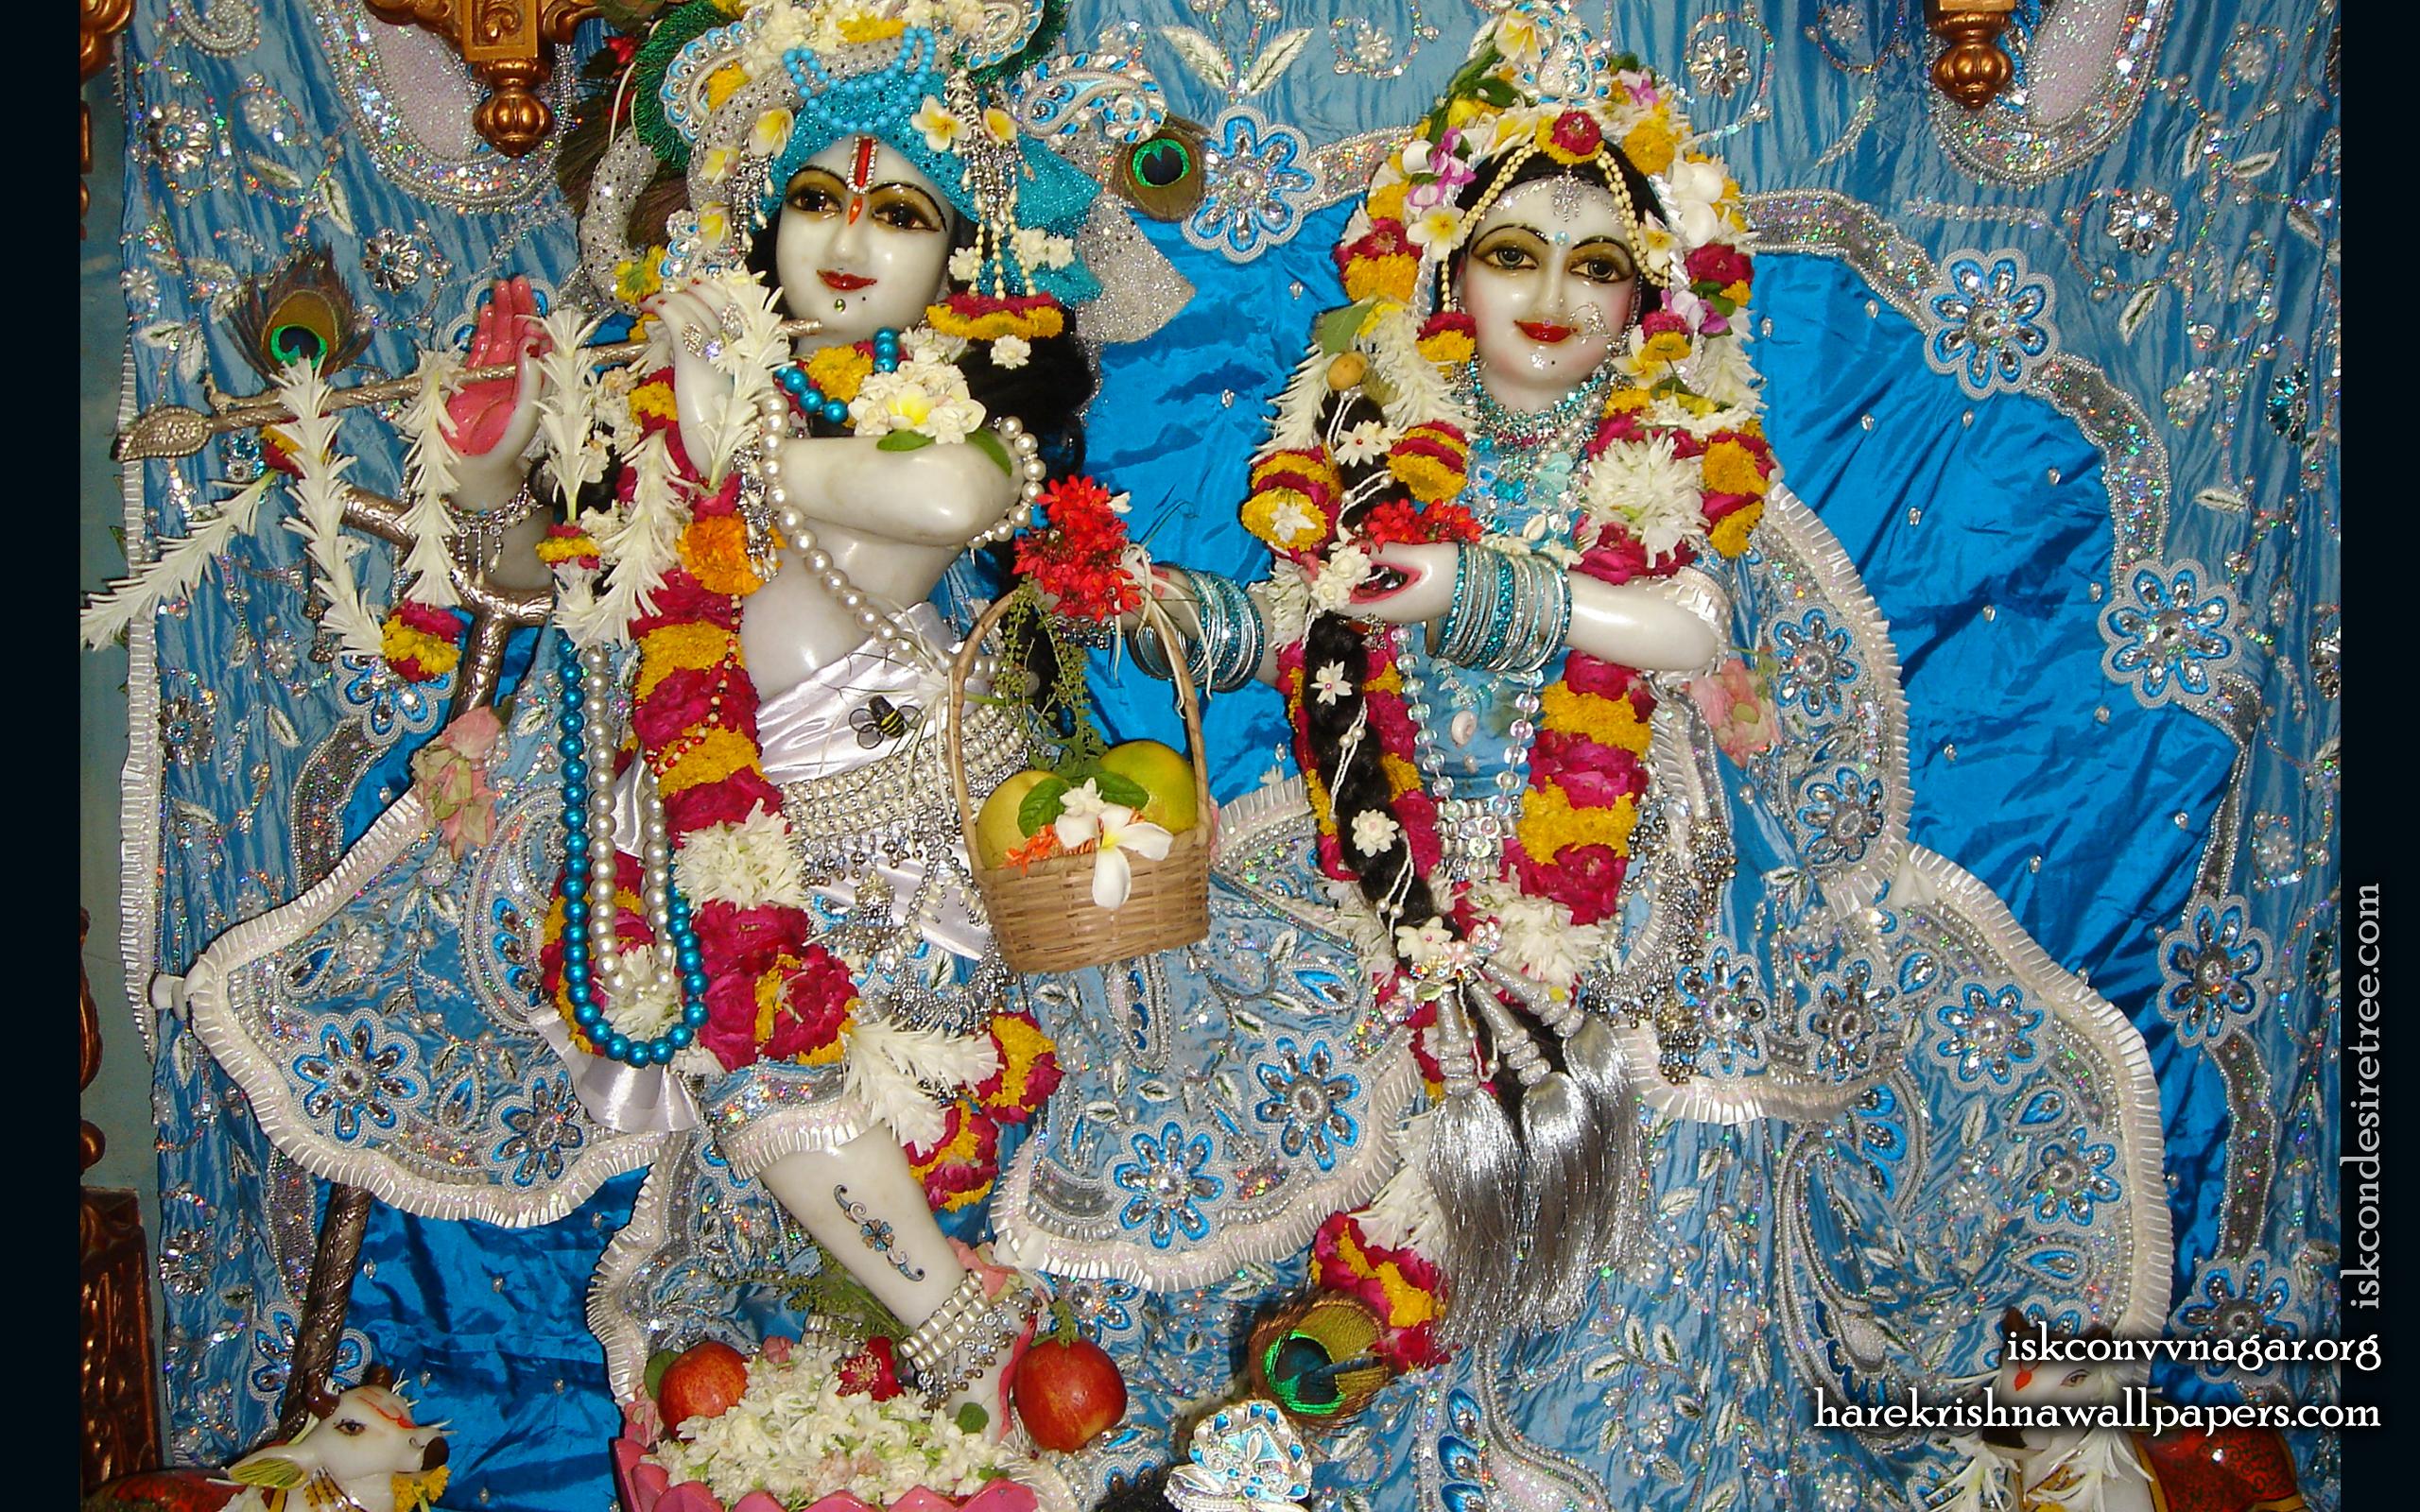 Sri Sri Radha Giridhari Wallpaper (022) Size 2560x1600 Download